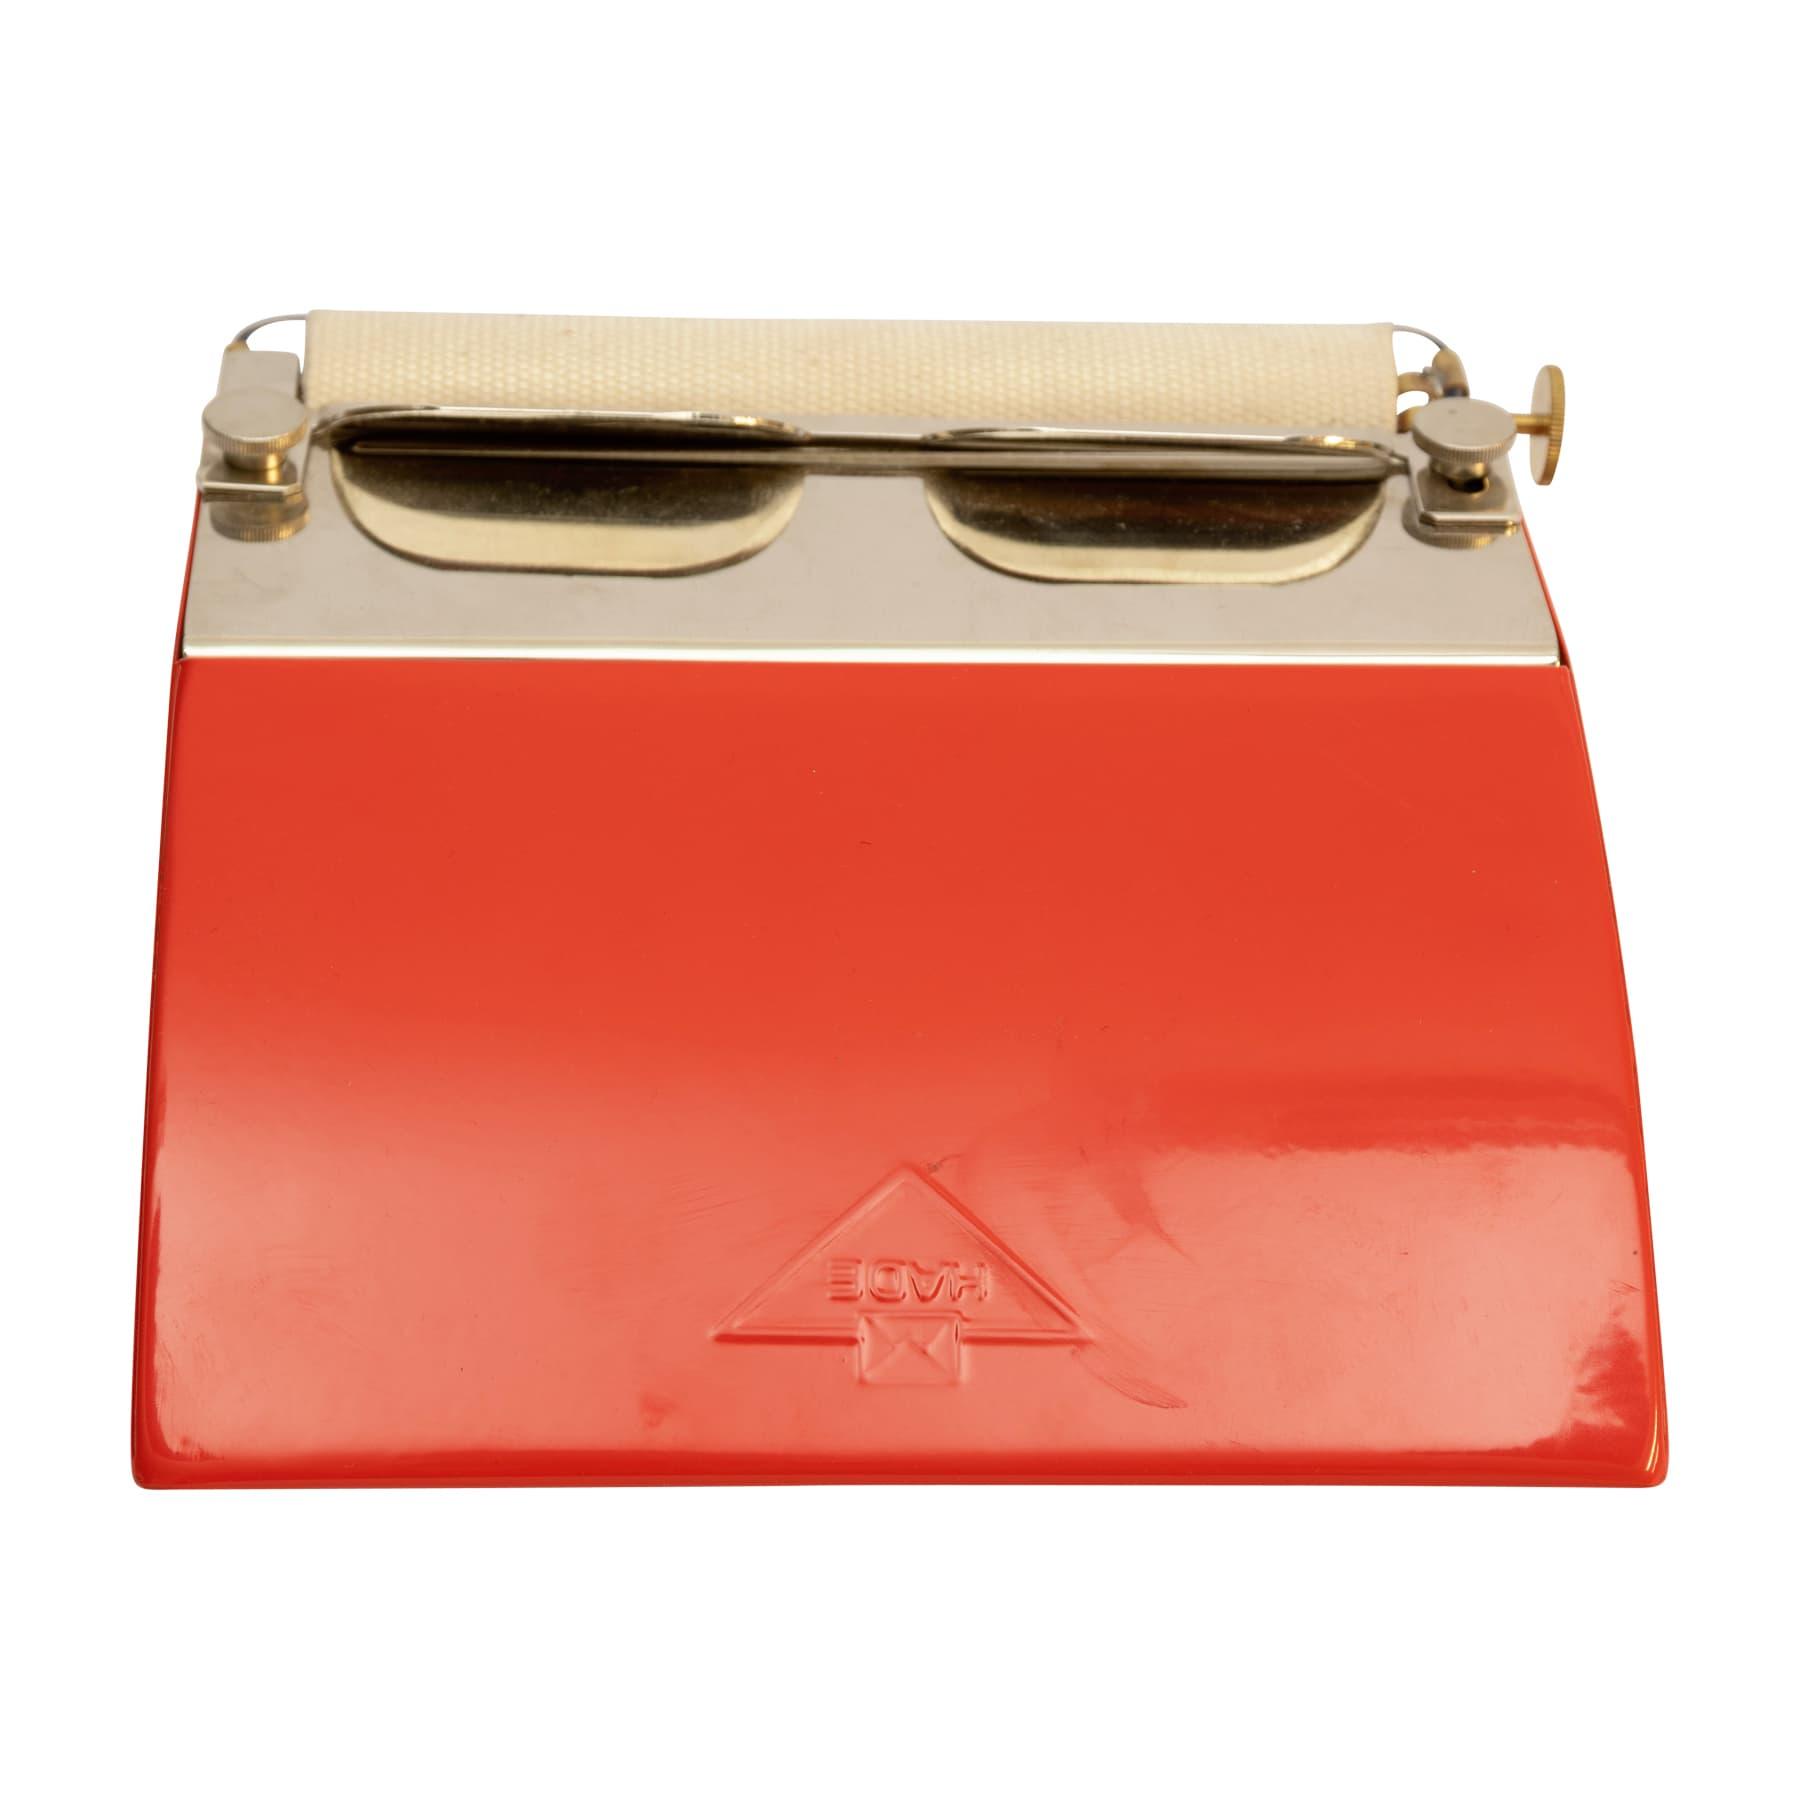 Beleimungsgerät / Etikettenbefeuchter / Etikettierer aus rot lackiertem Metall